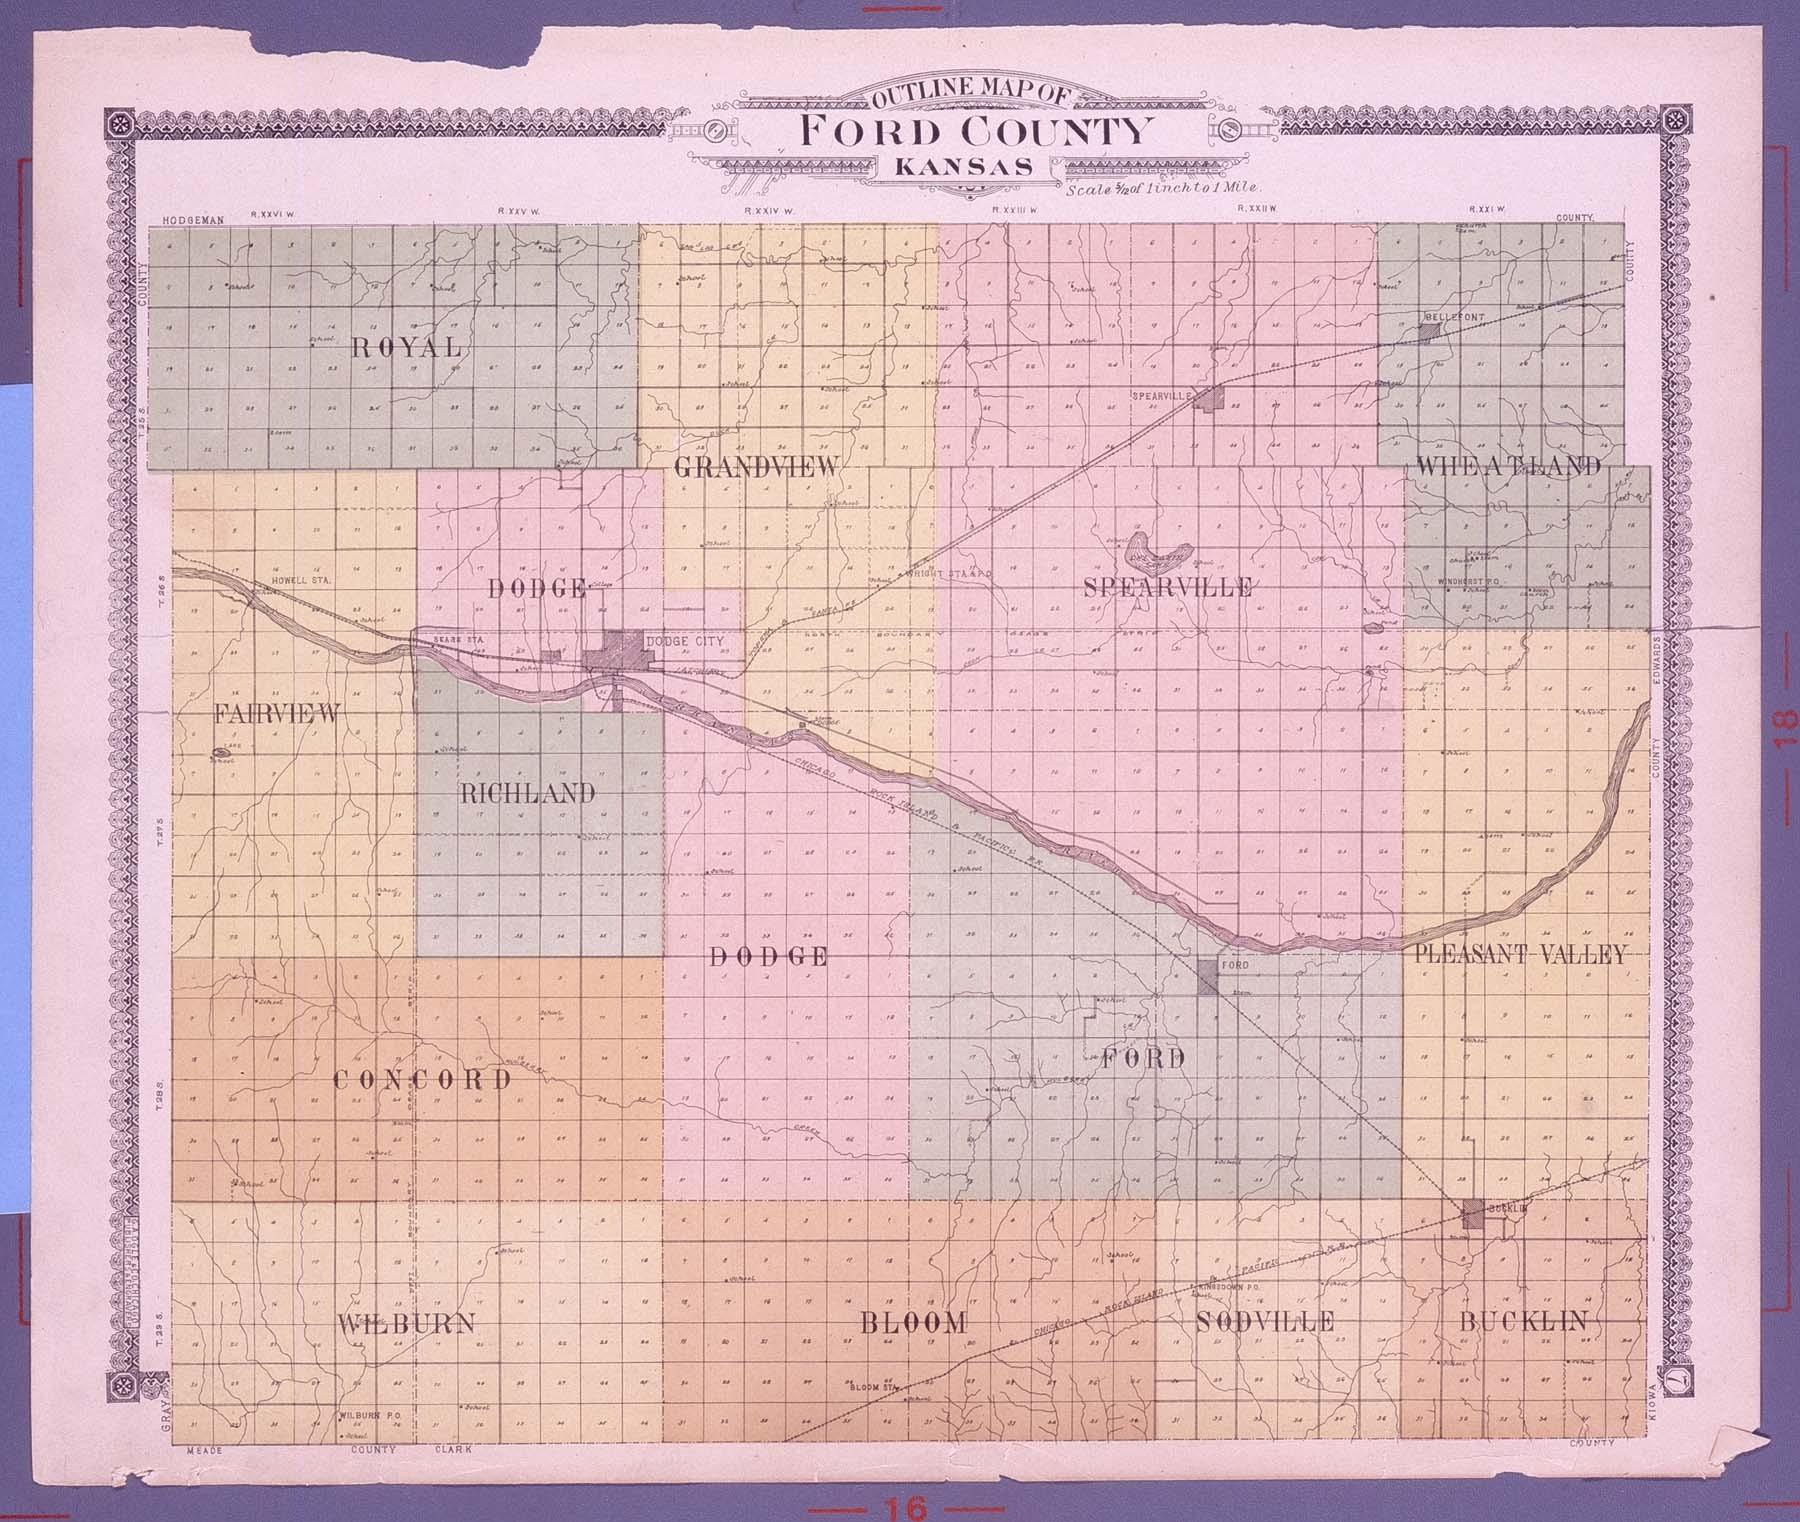 Standard atlas of Ford County, Kansas - 7